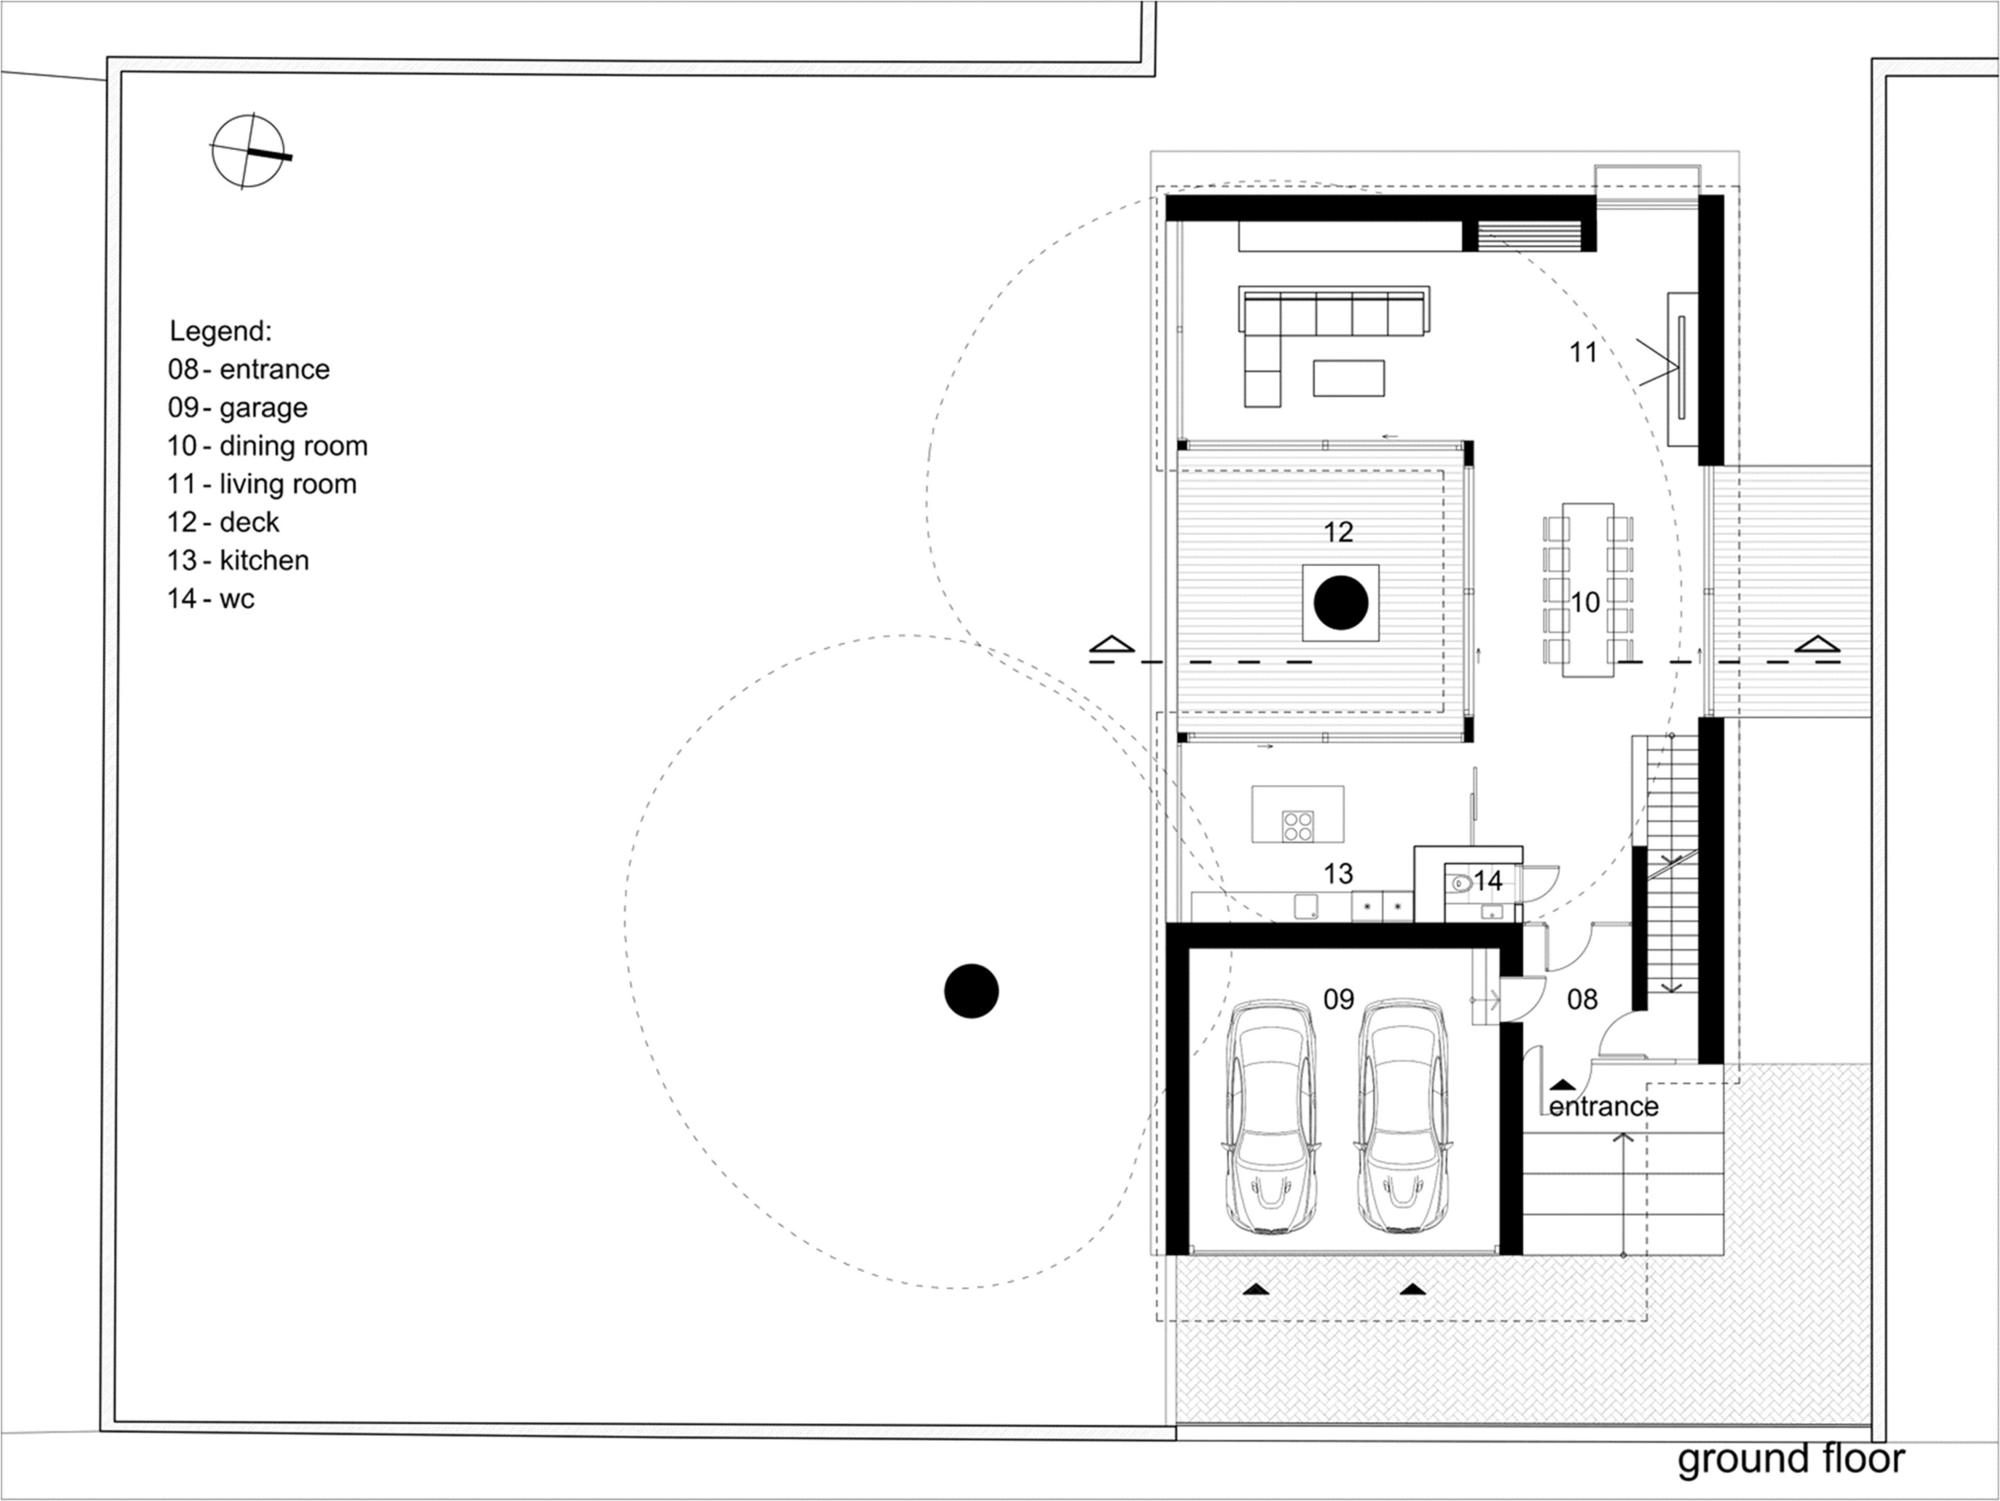 2-oaks-house-obia_obia_2oaks_drawing_01